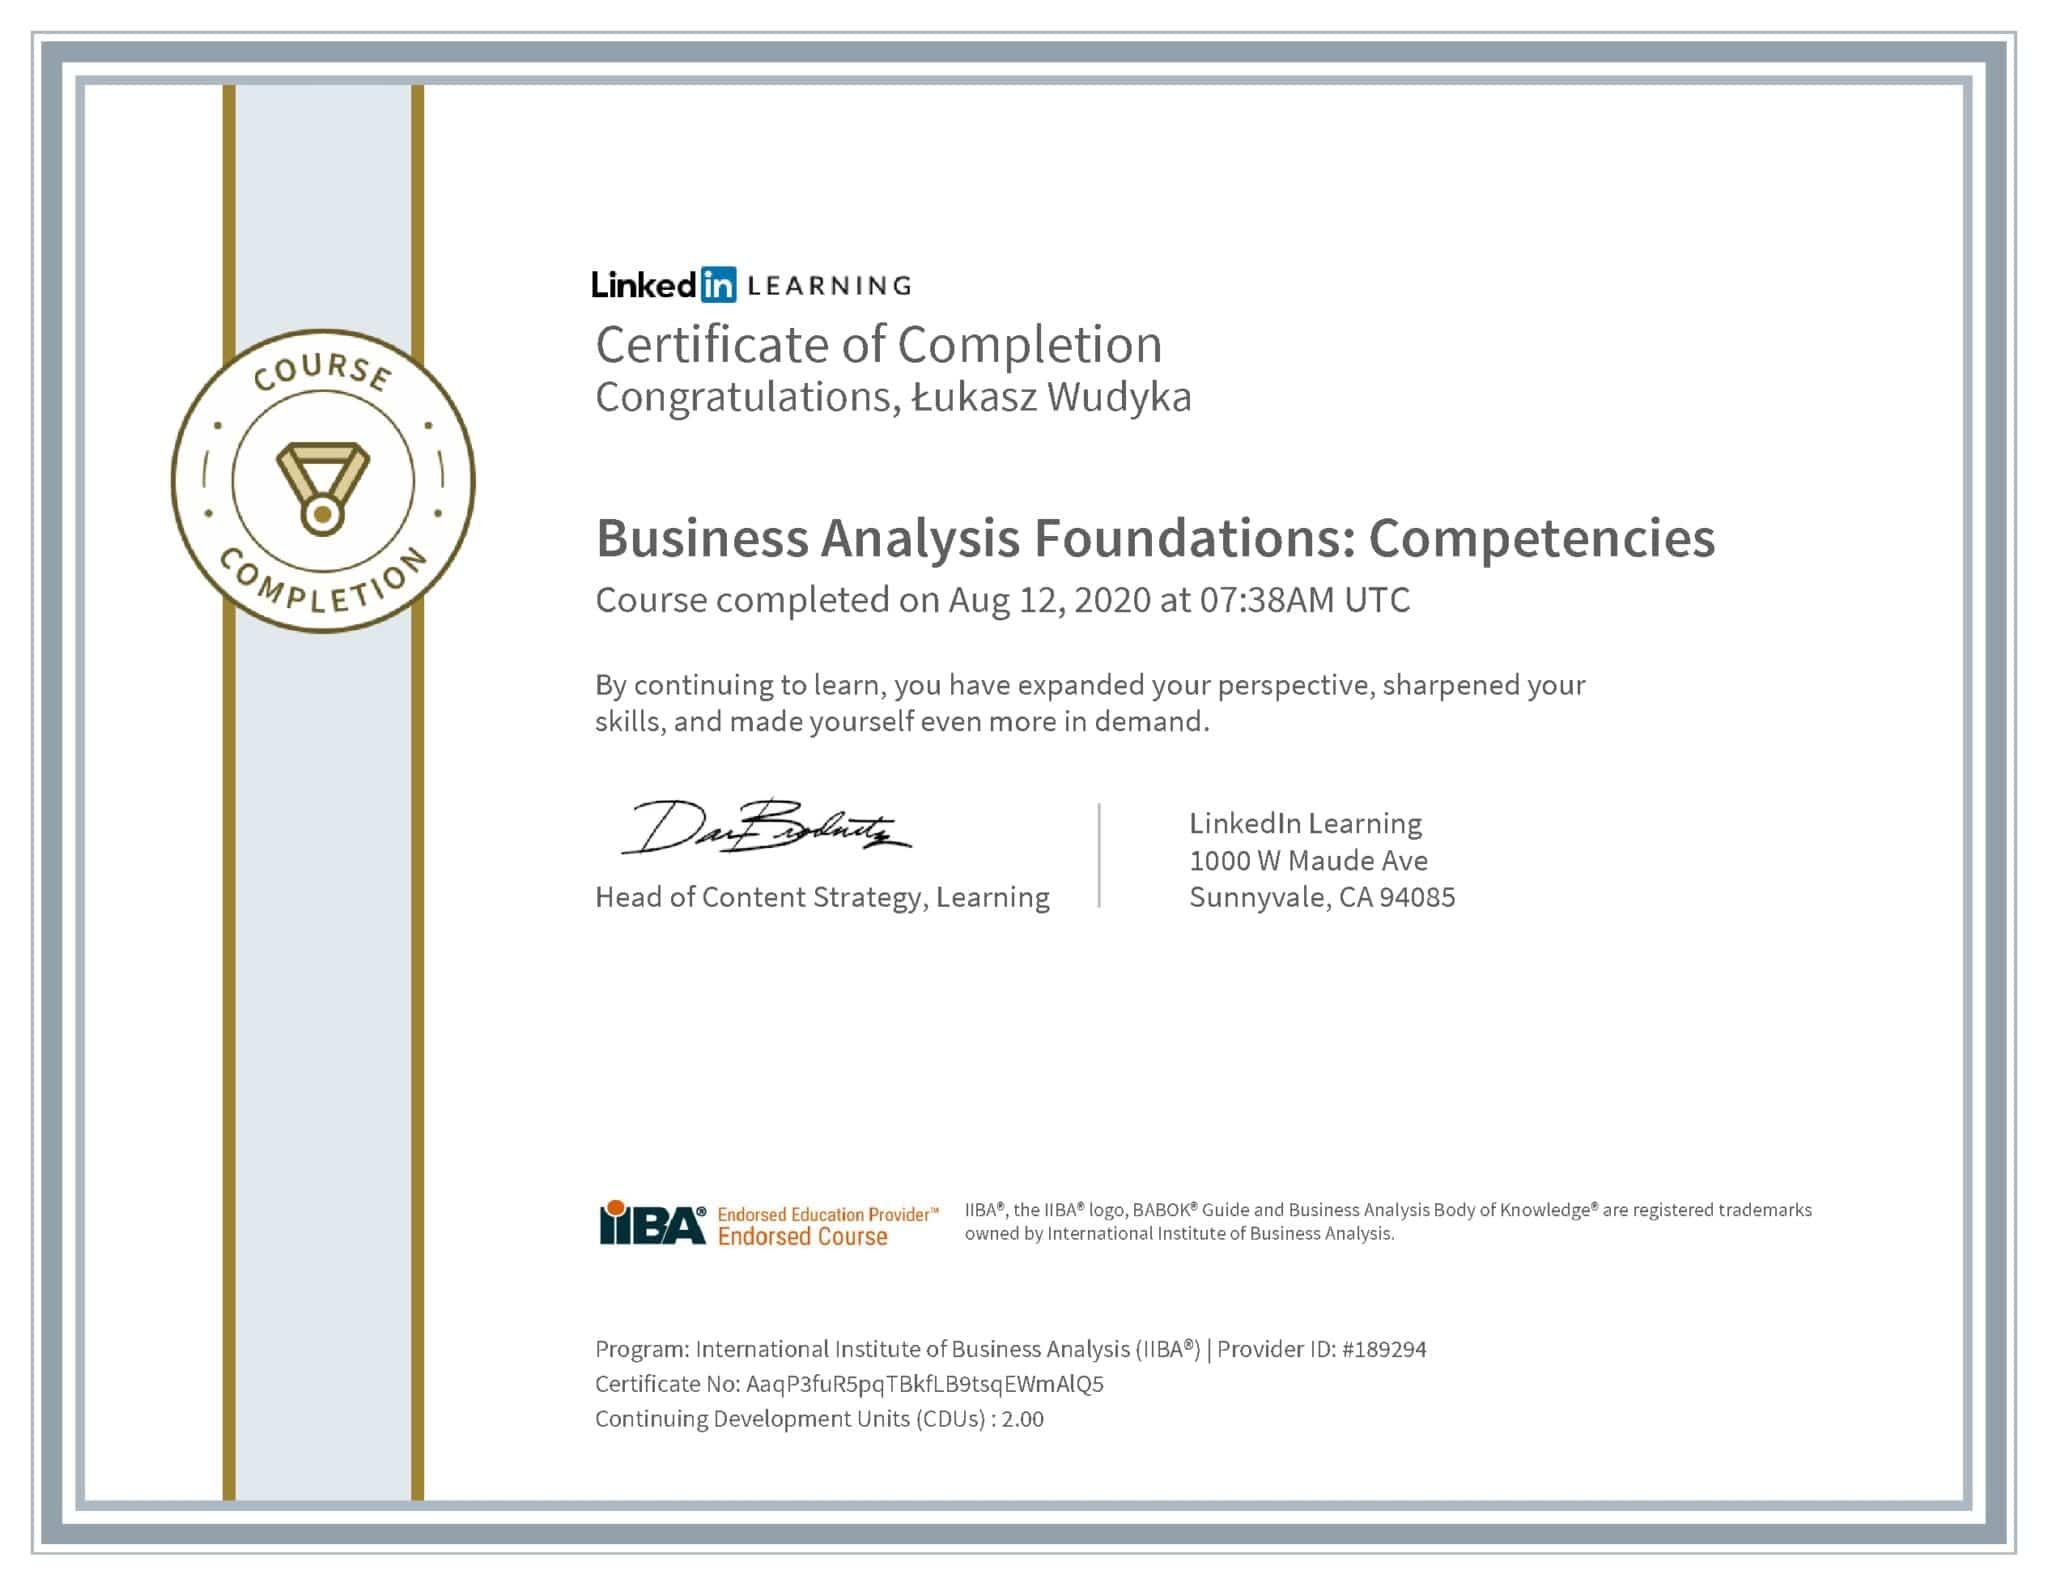 Łukasz Wudyka certyfikat LinkedIn Business Analysis Foundations: Competencies IIBA